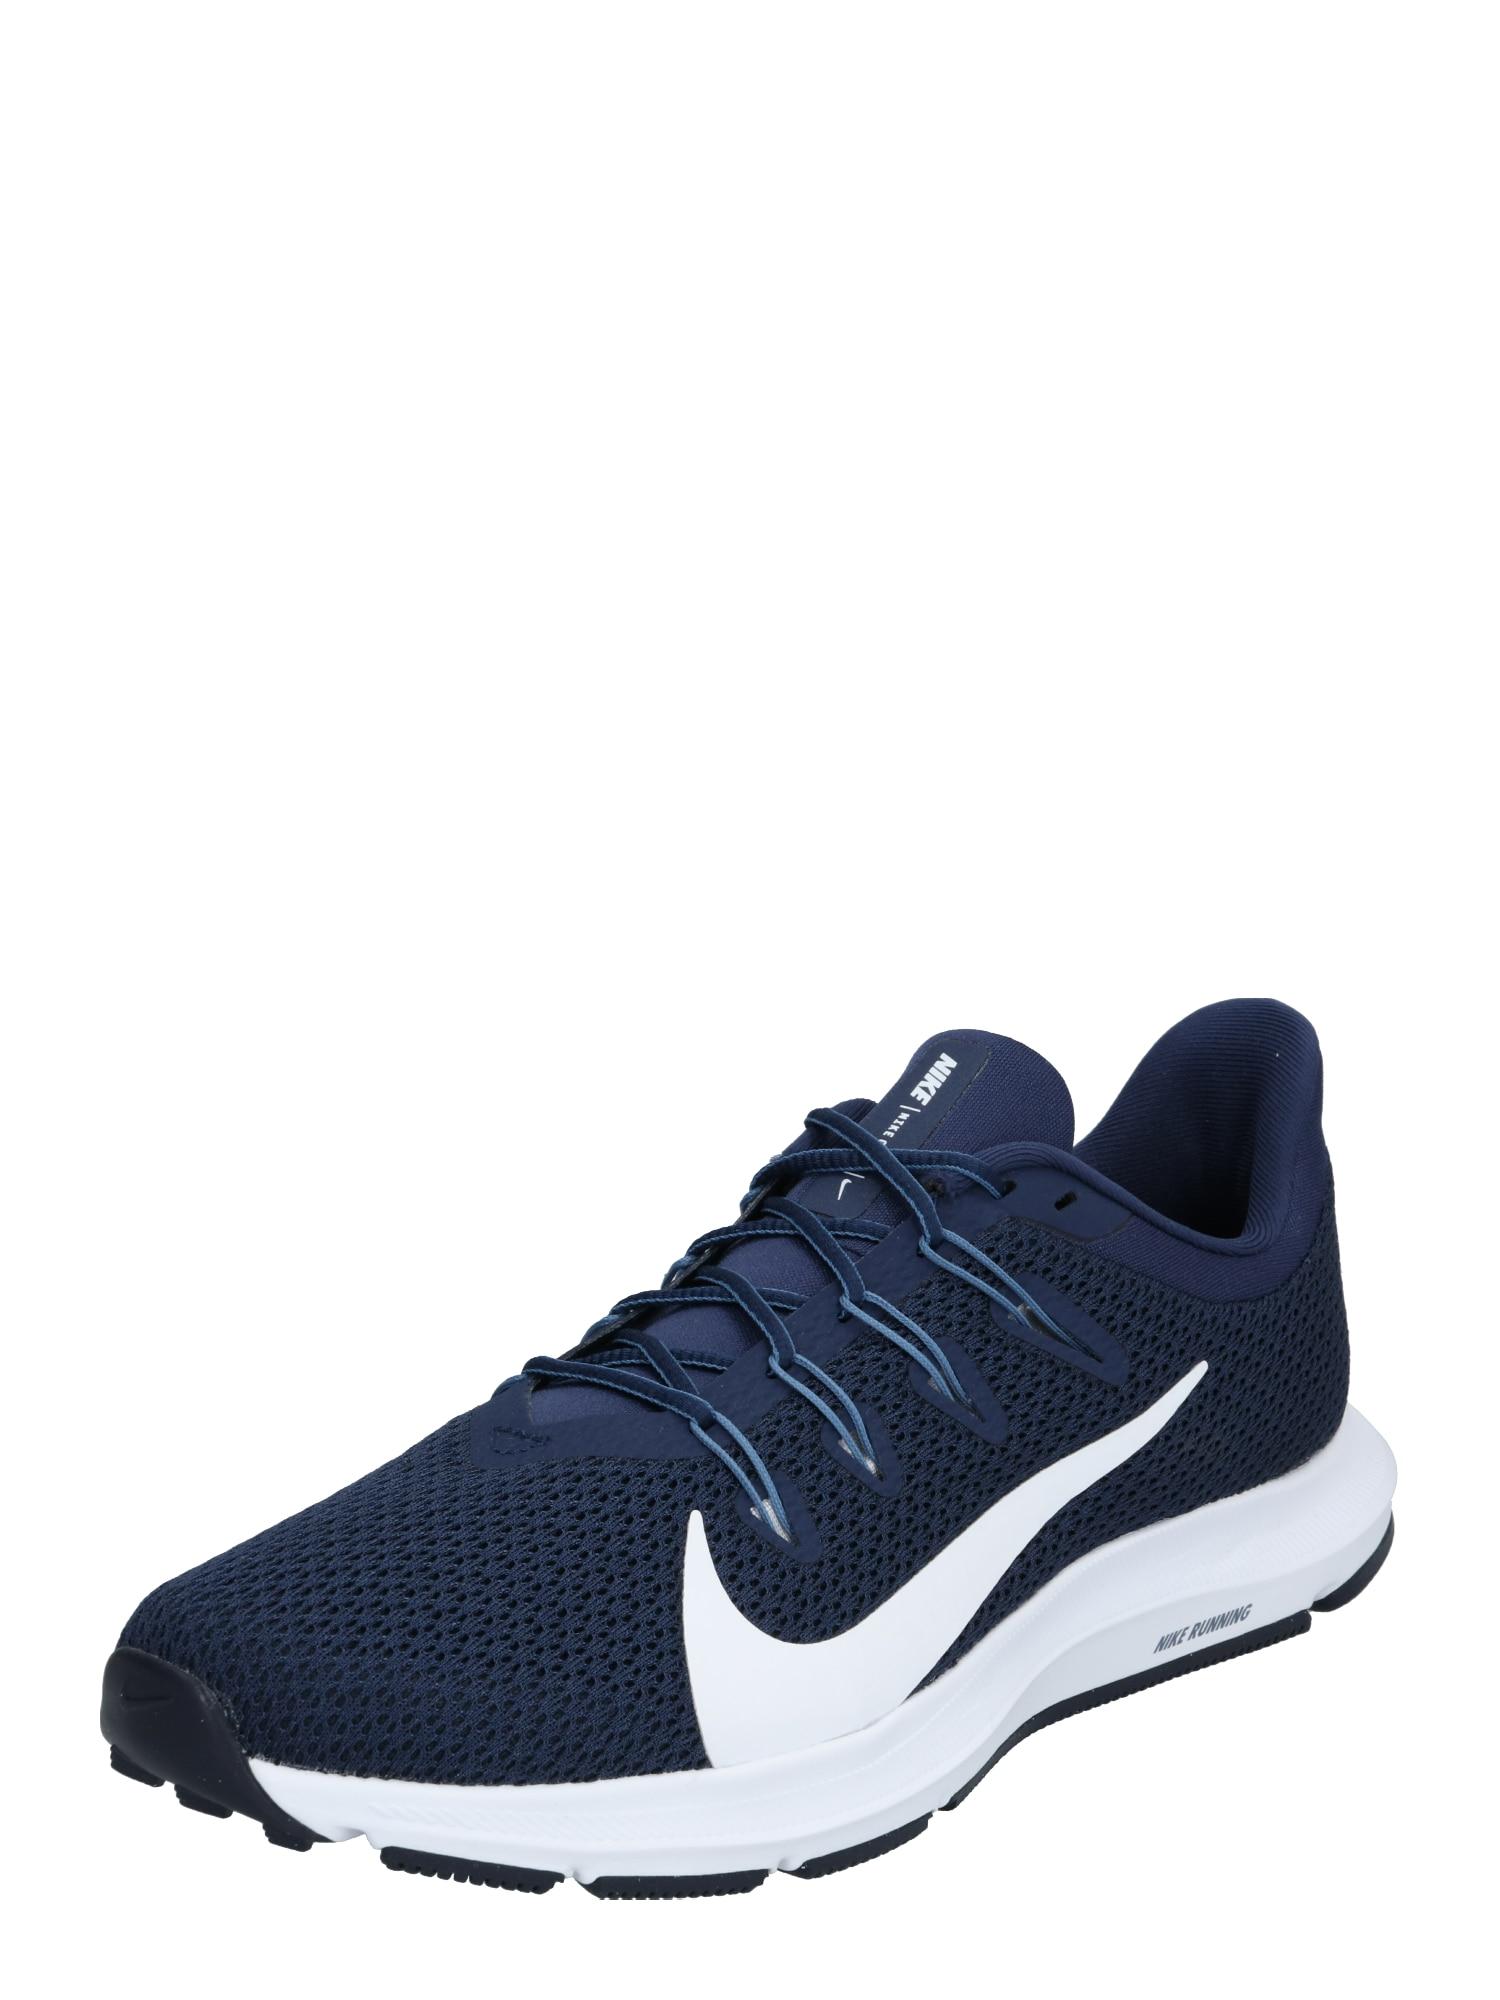 NIKE Bėgimo batai 'QUEST 2' balta / tamsiai mėlyna